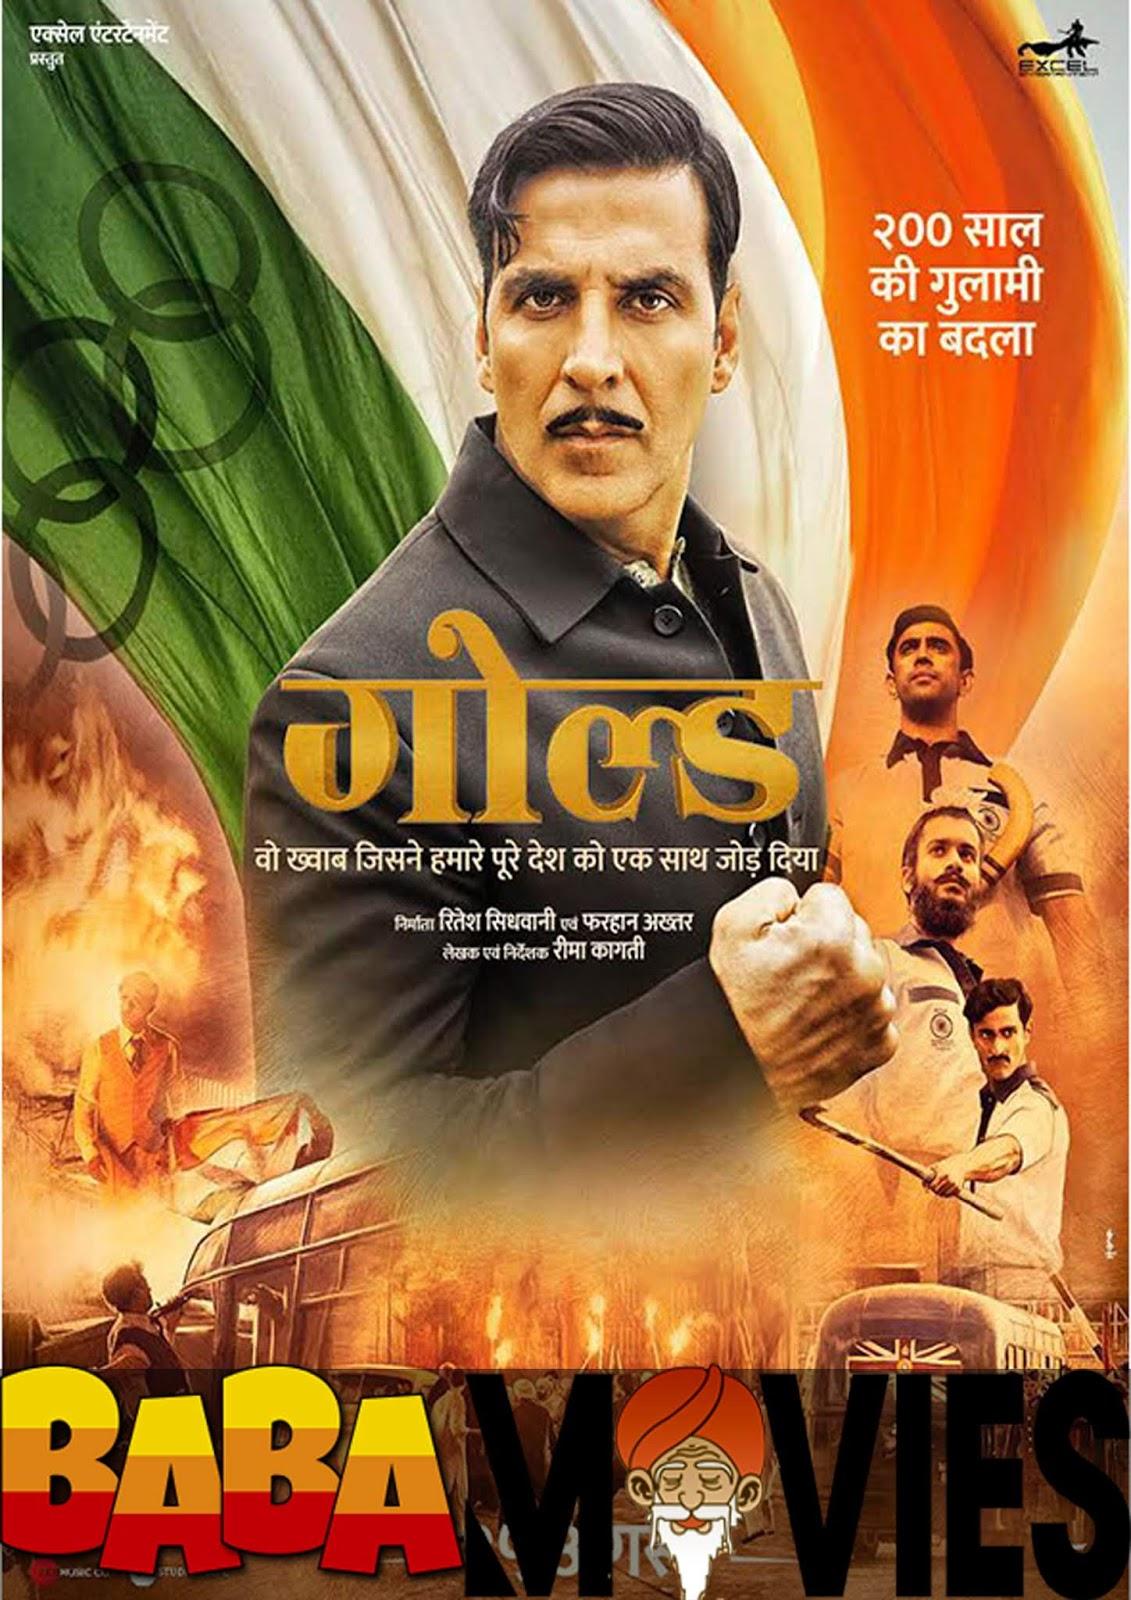 Movies hindi 2018 hd | Zero 2018 Full Hindi Movie Free